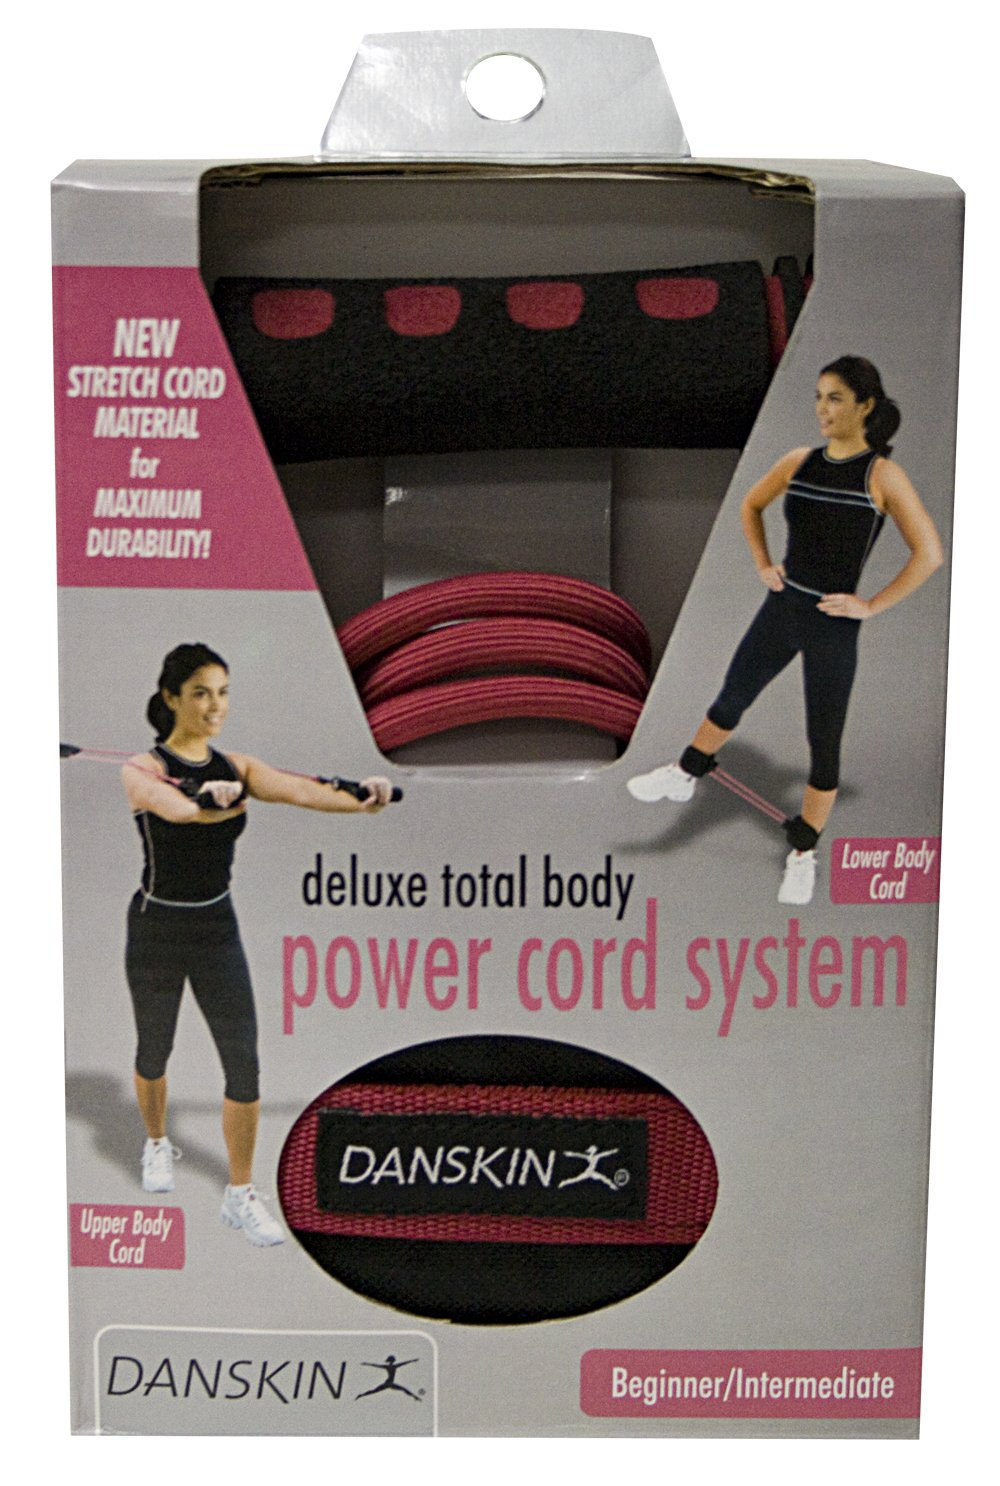 Danskin Deluxe Total Body Power Cord System DA-2857R